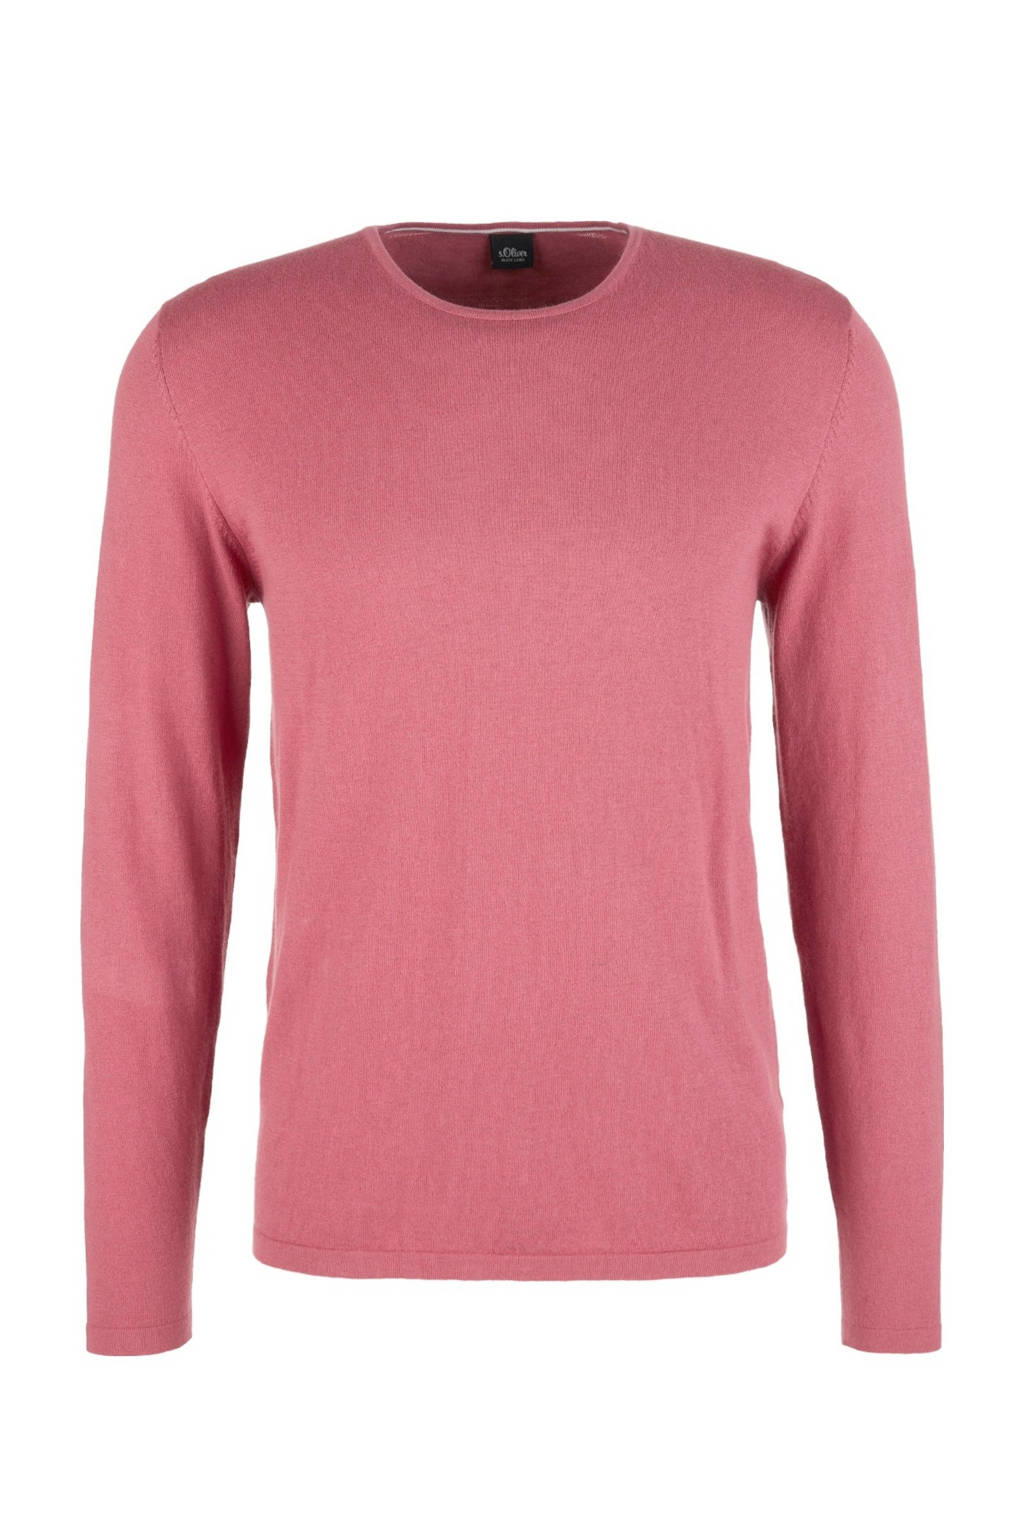 s.Oliver BLACK LABEL sweater roze, Roze